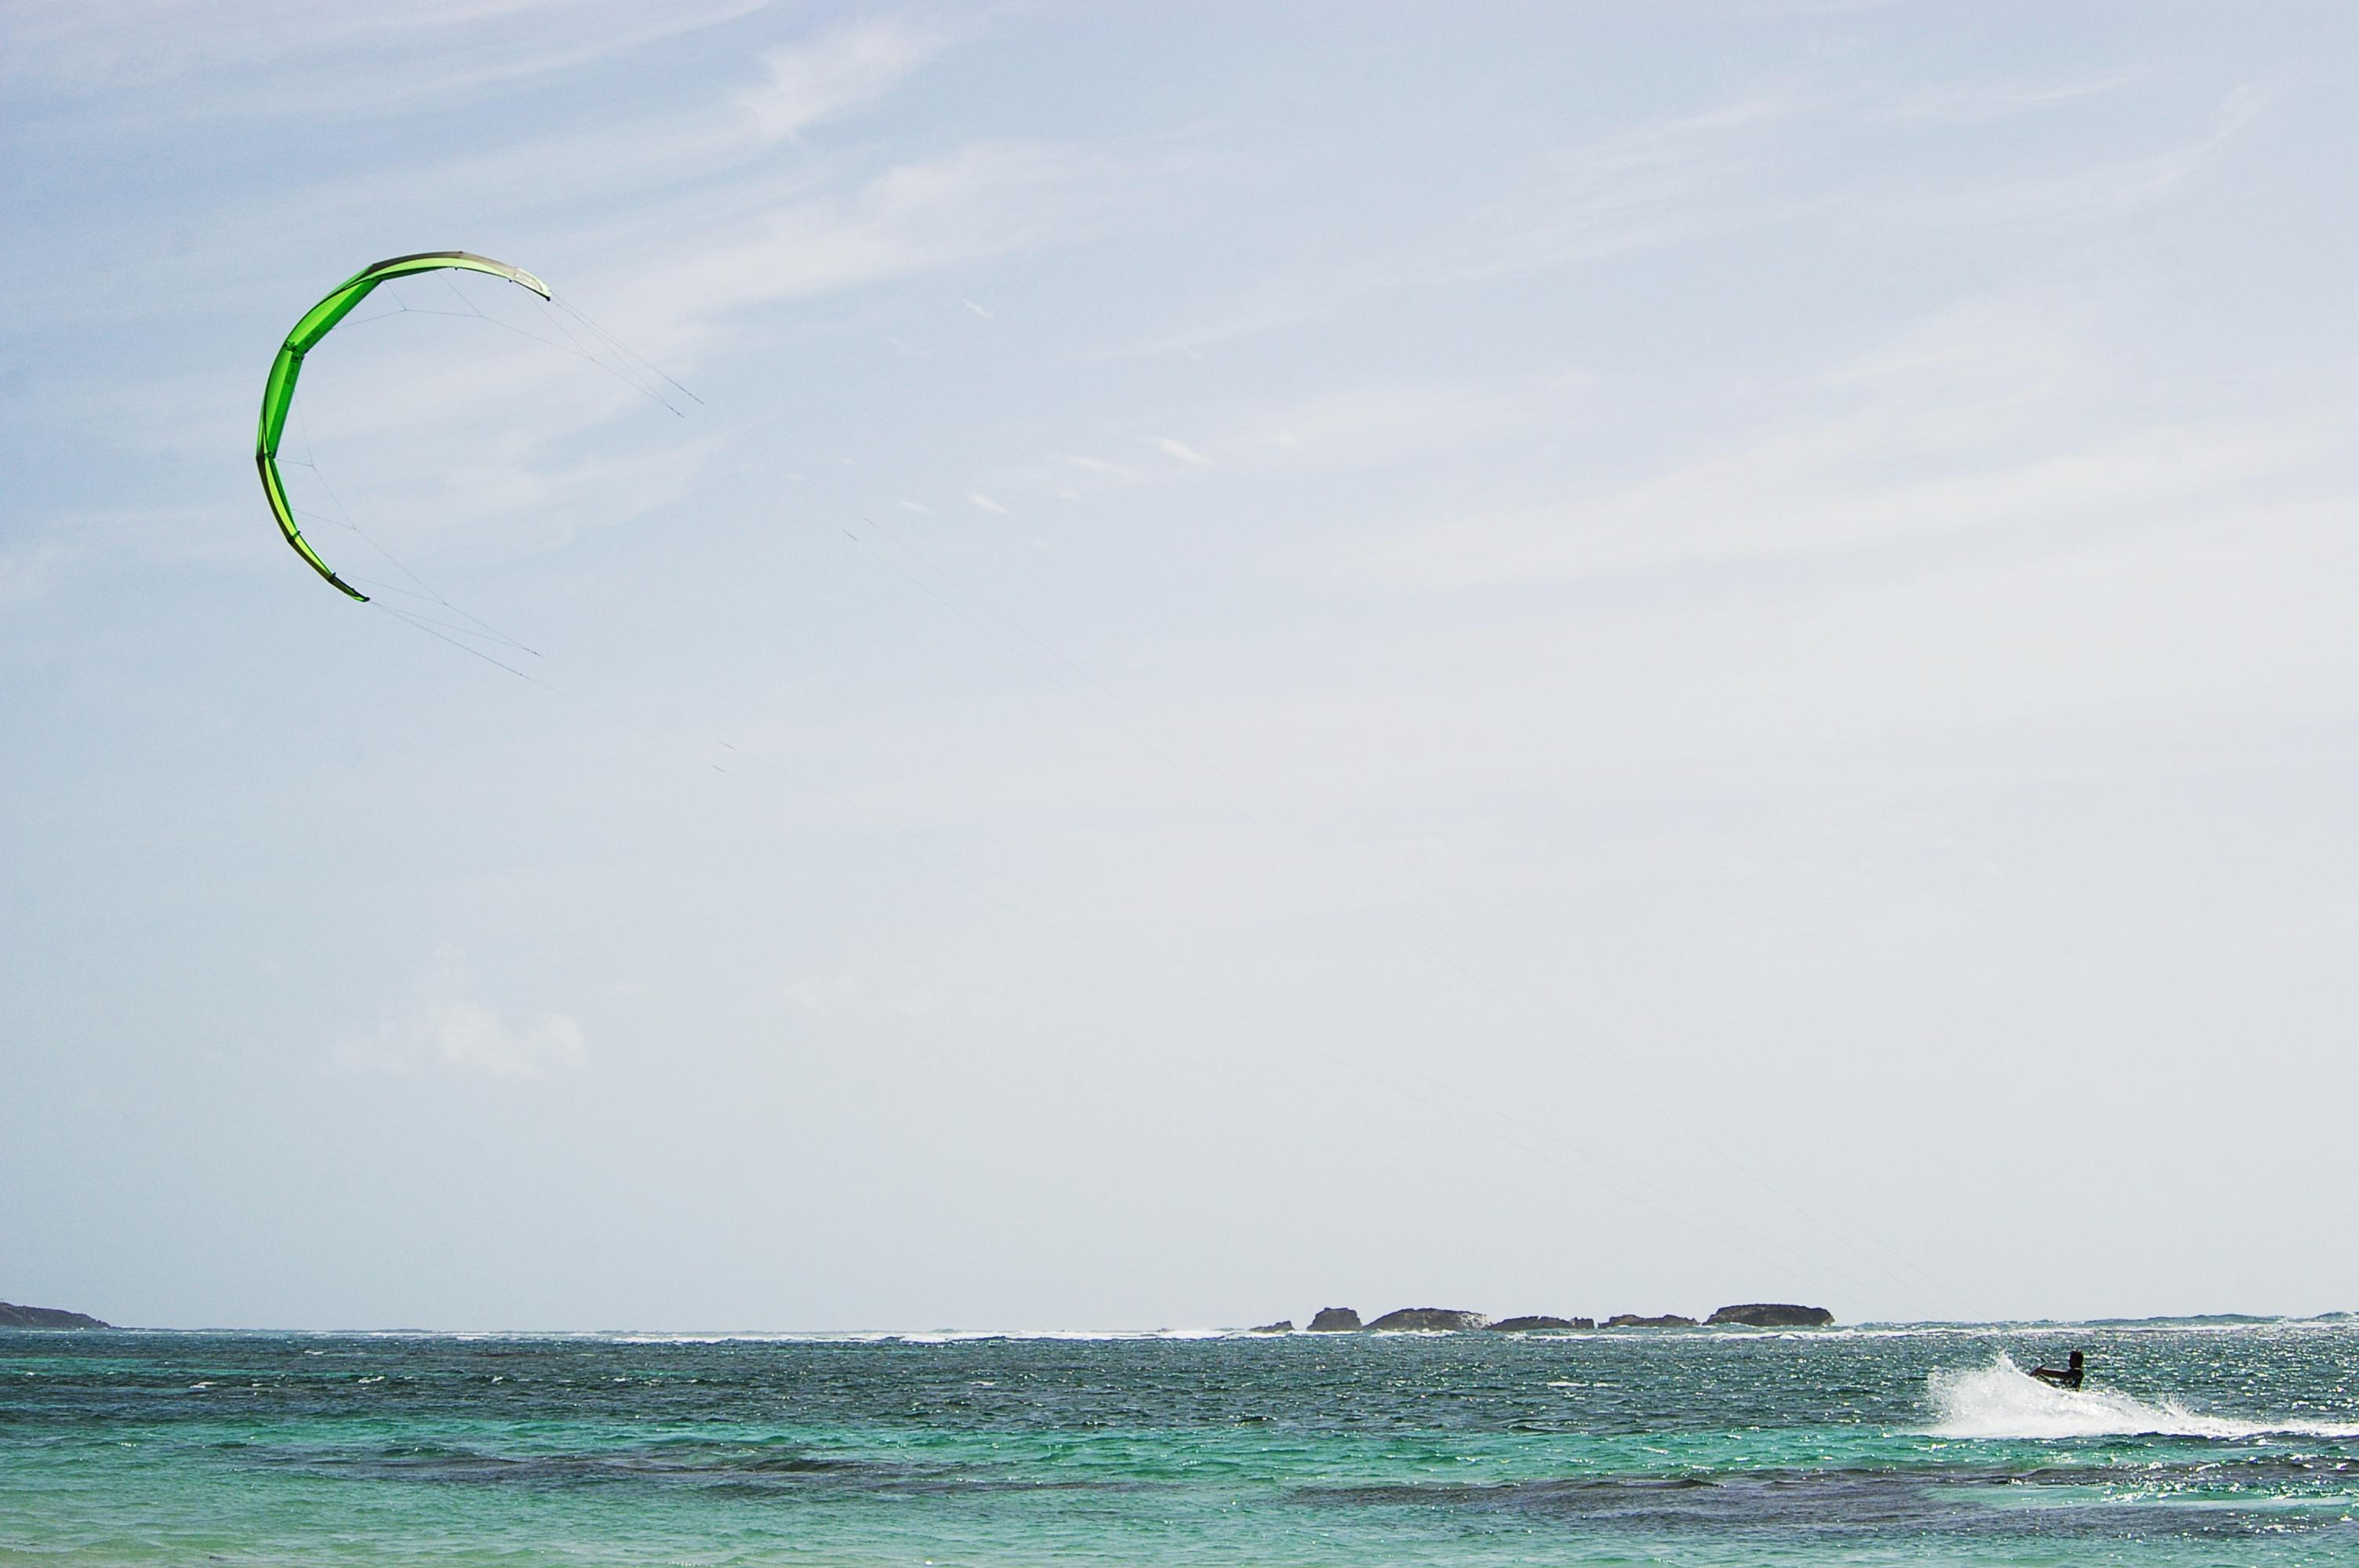 Kite surf, Aqua, Attraction, Extreme, Fast, HQ Photo